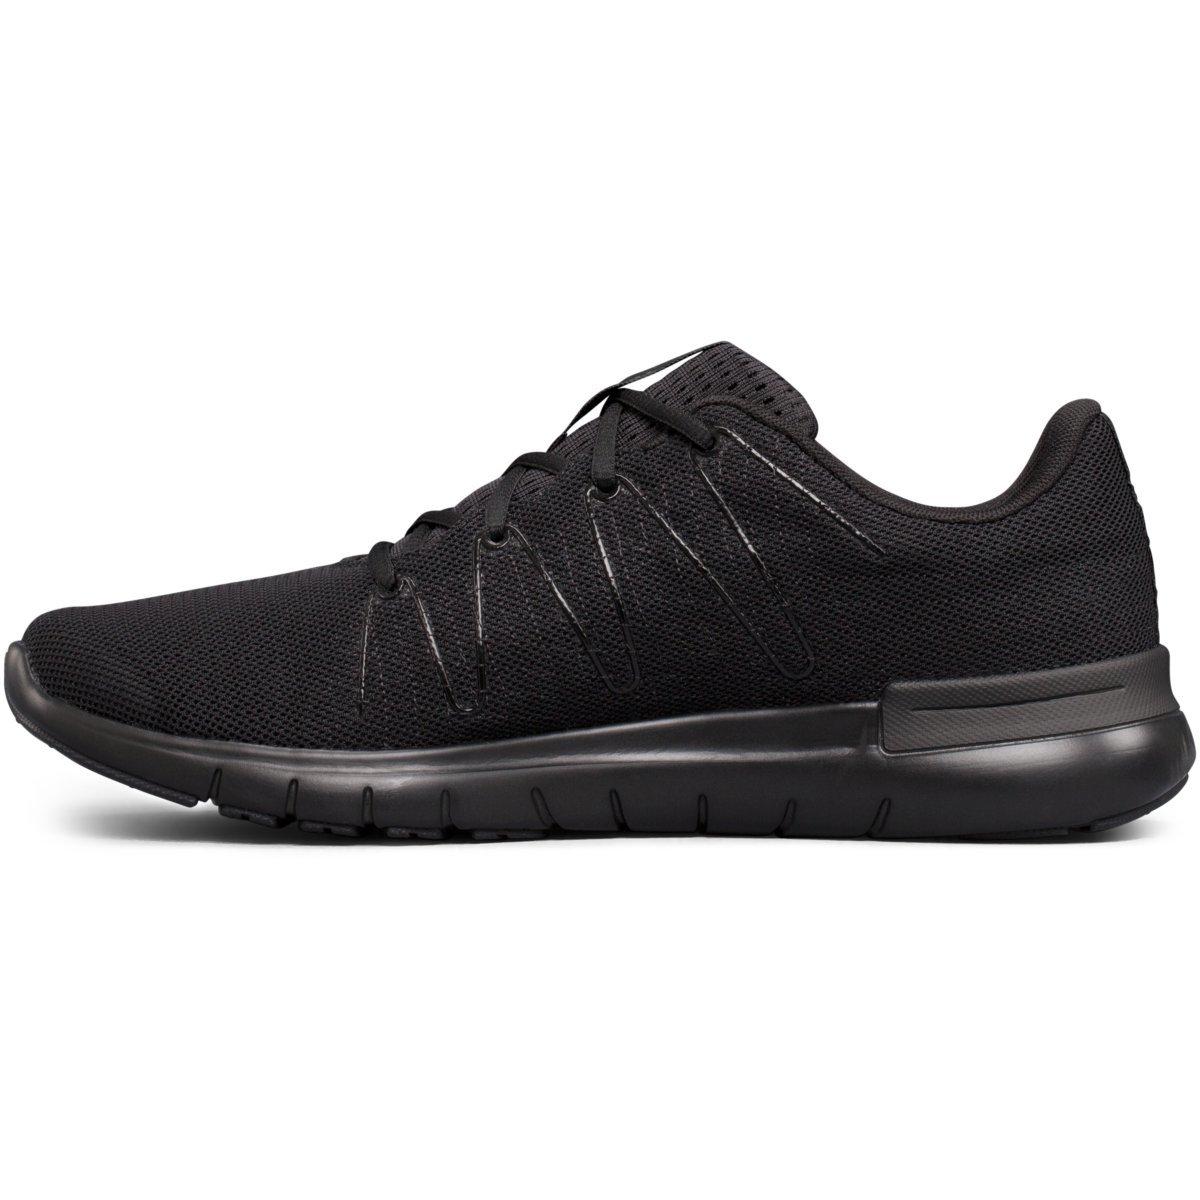 Thrill 3 Running Shoes, Triple Black